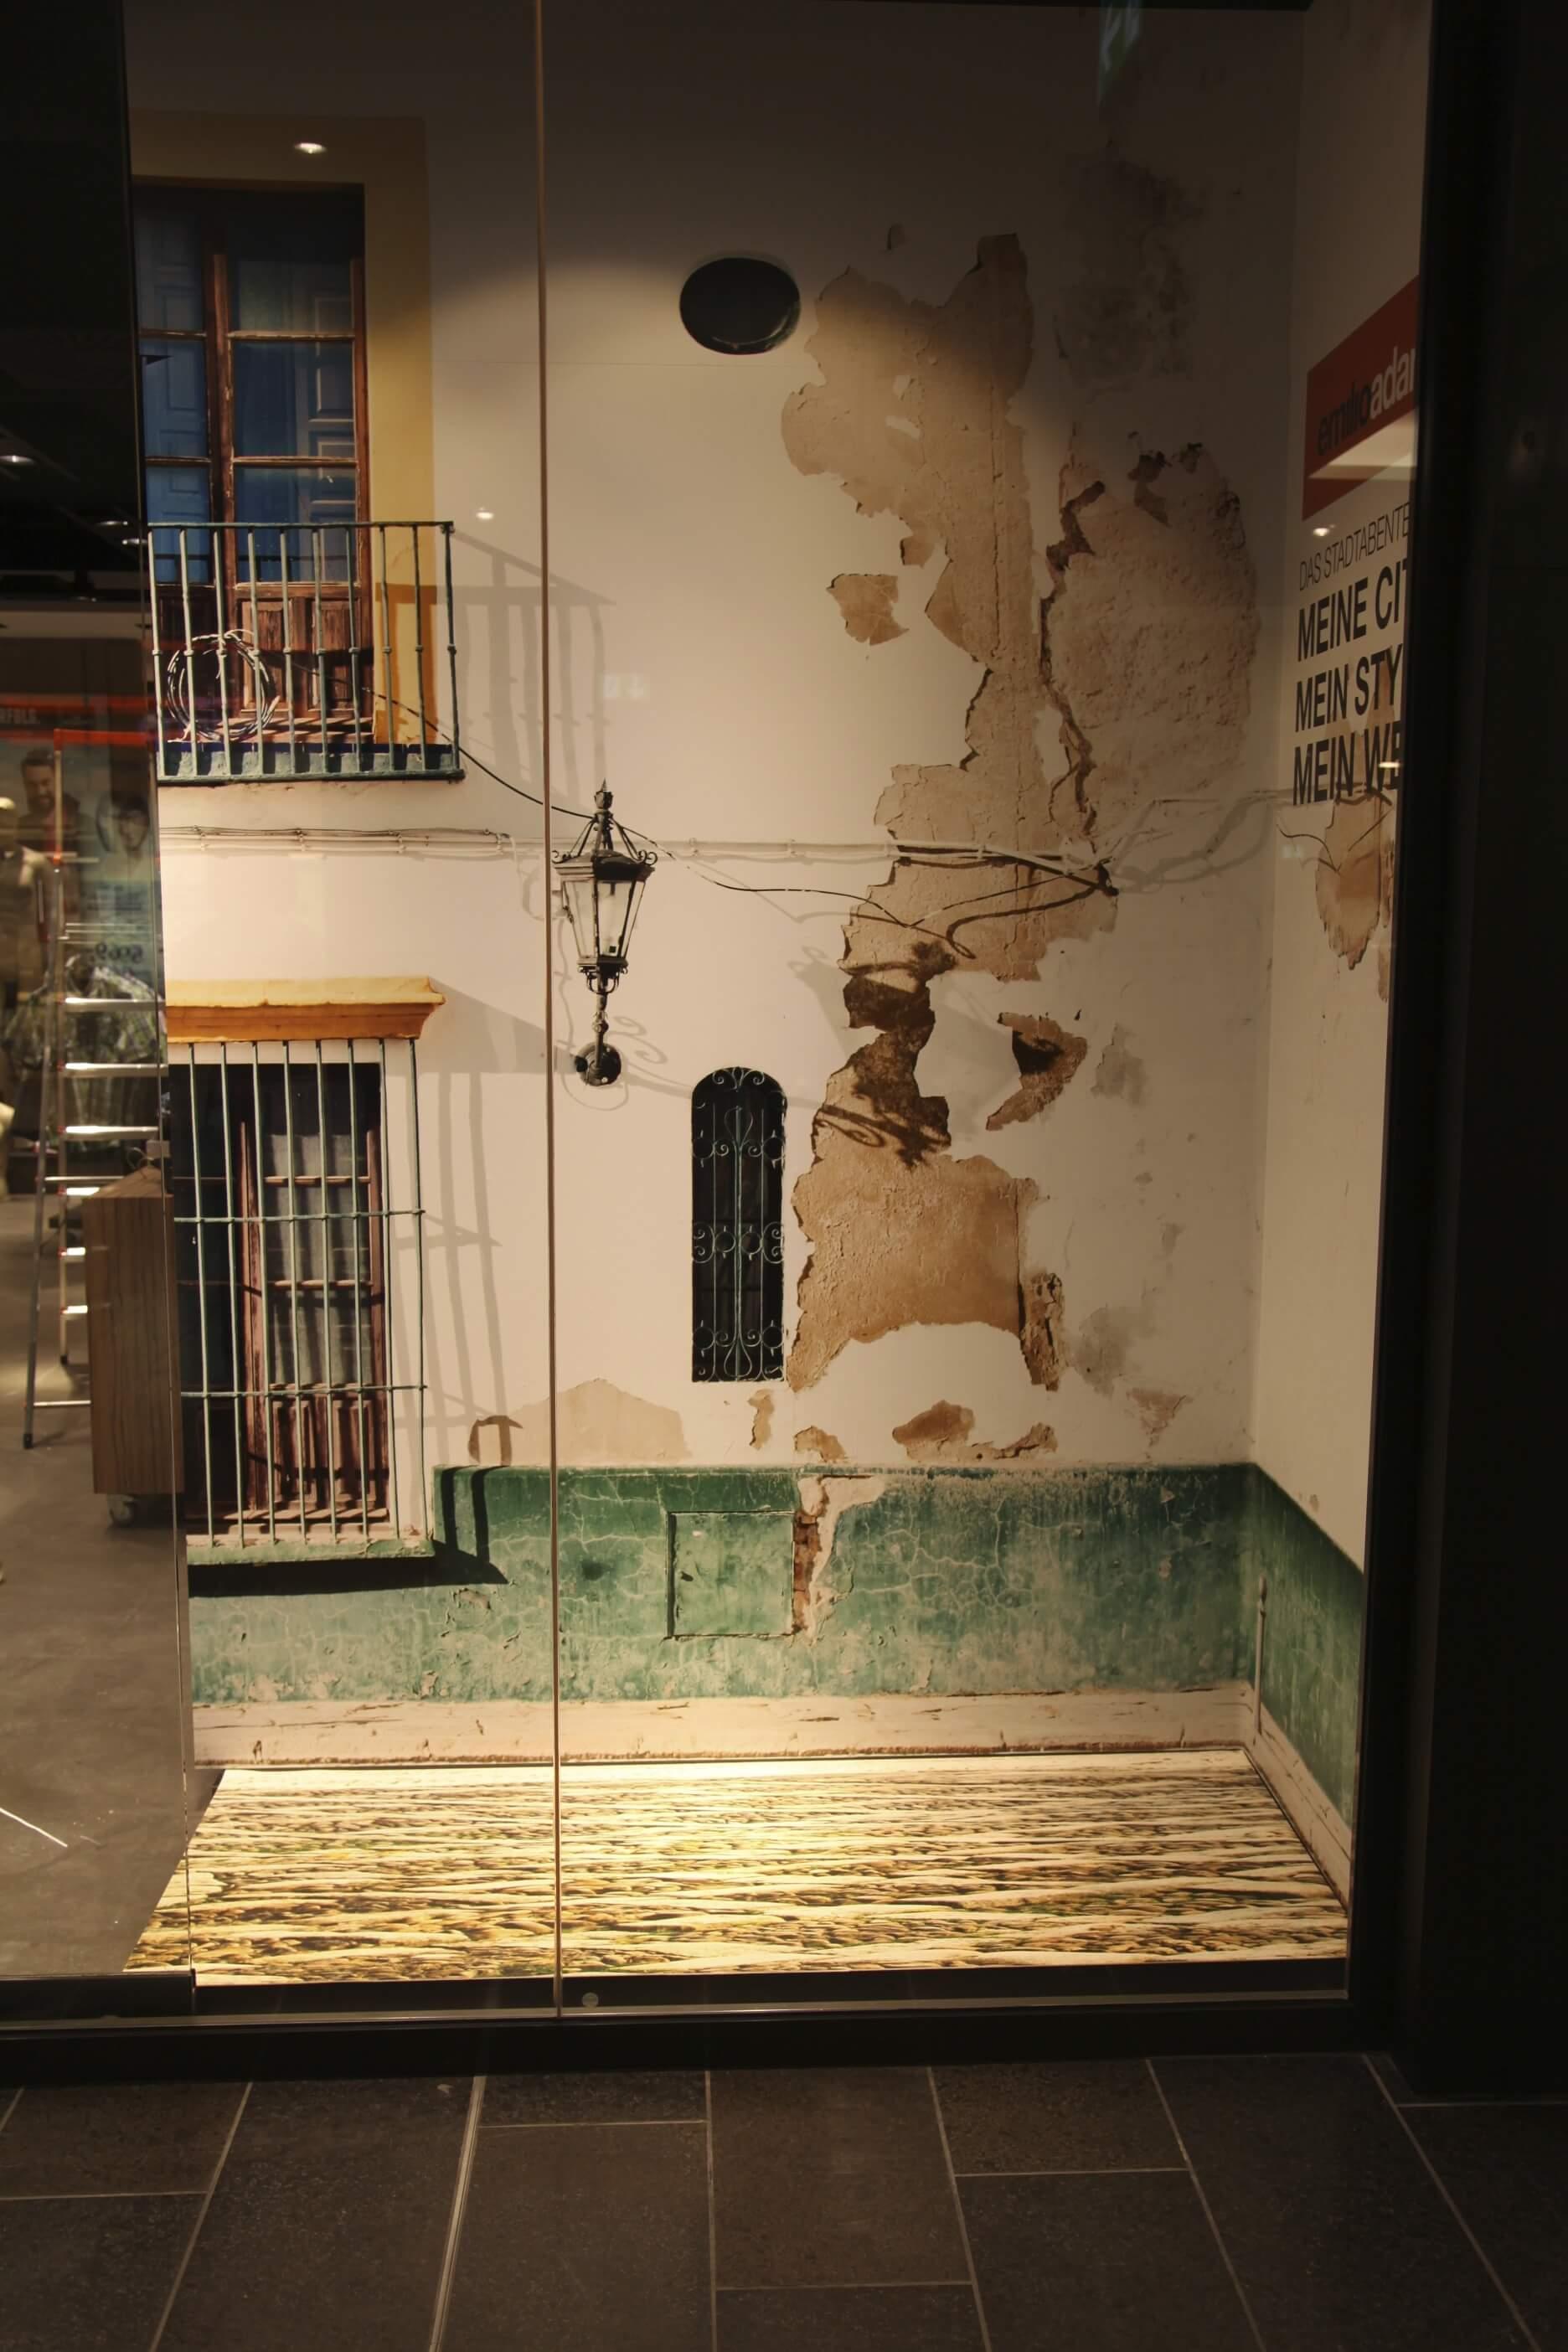 Getaltung Boden Schaufenster bedruckt